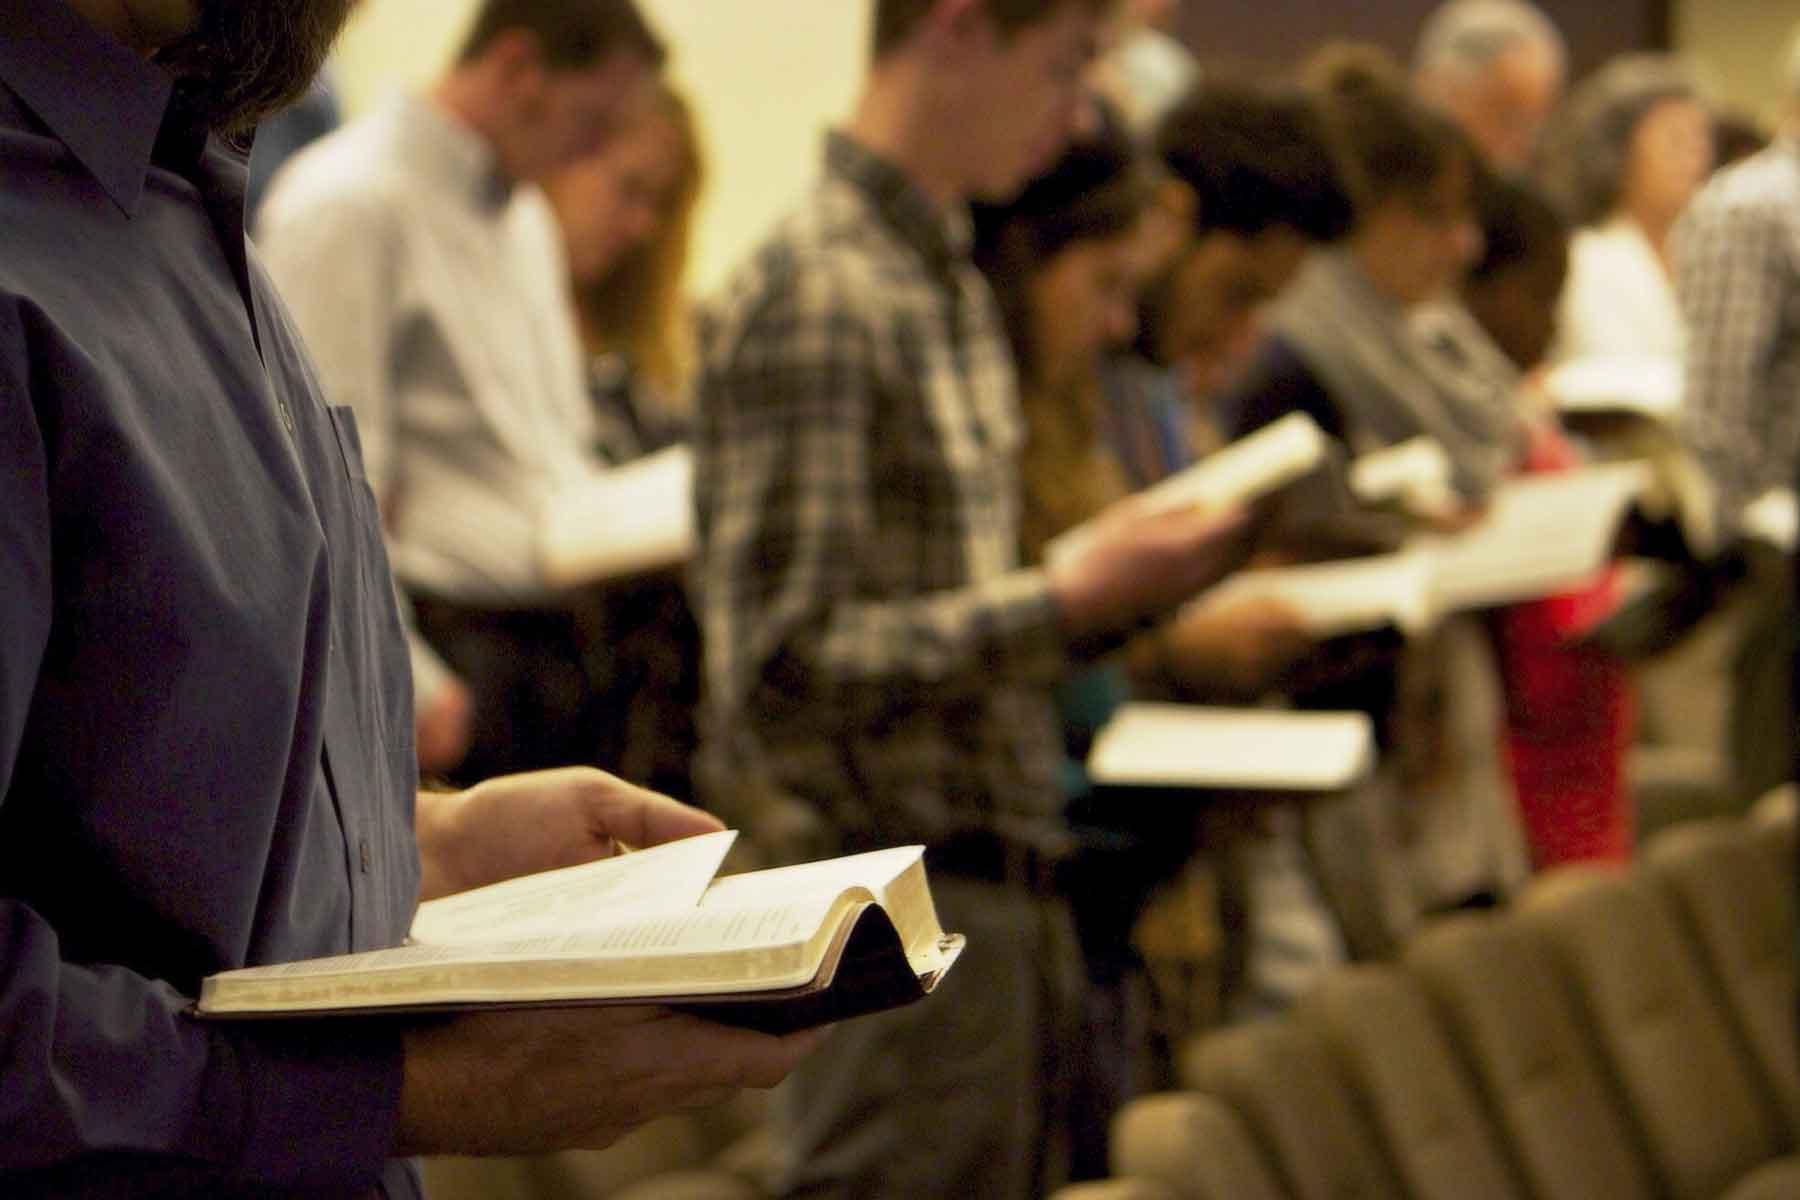 1800-congregation-Scripture-reading-PV-Bible-Church-Sunday-worship